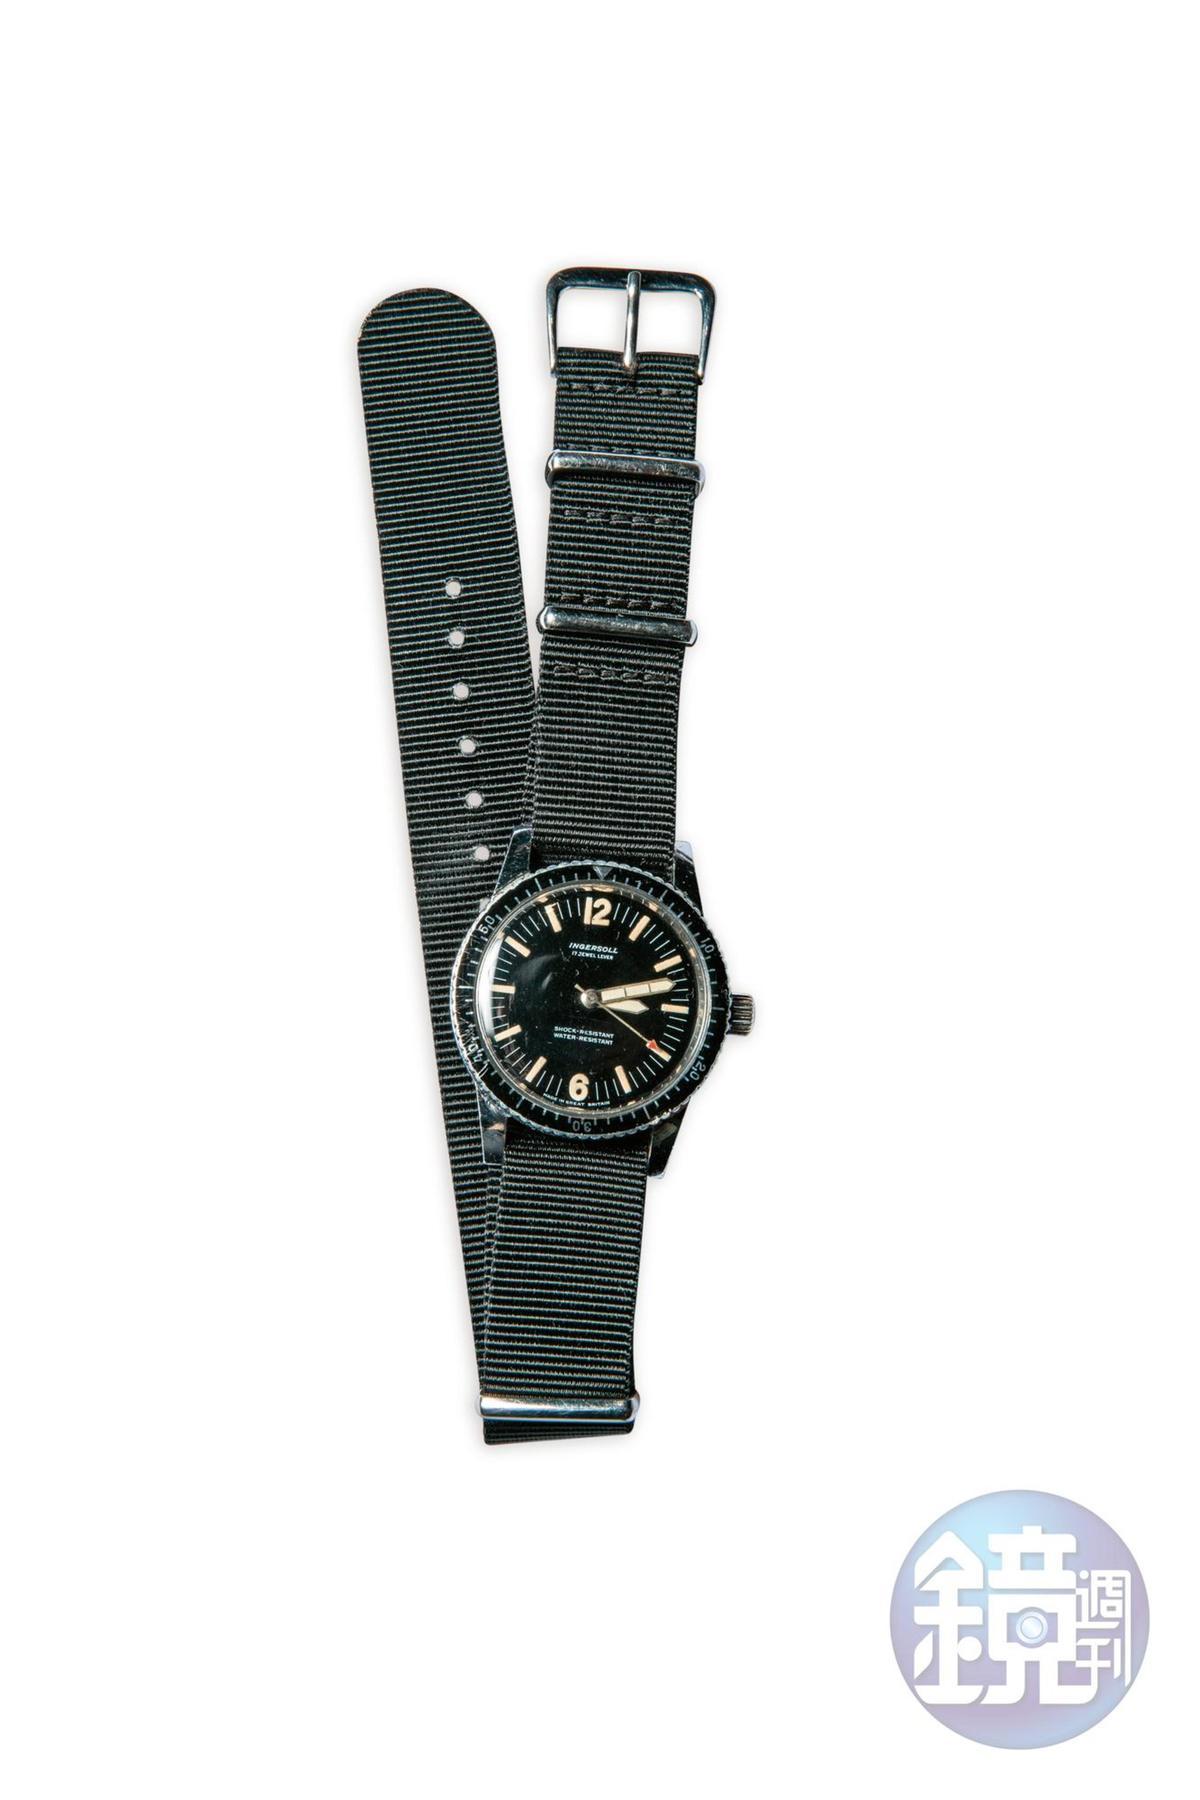 60年代設計的INGERSOLL腕錶,約NT$4,000。